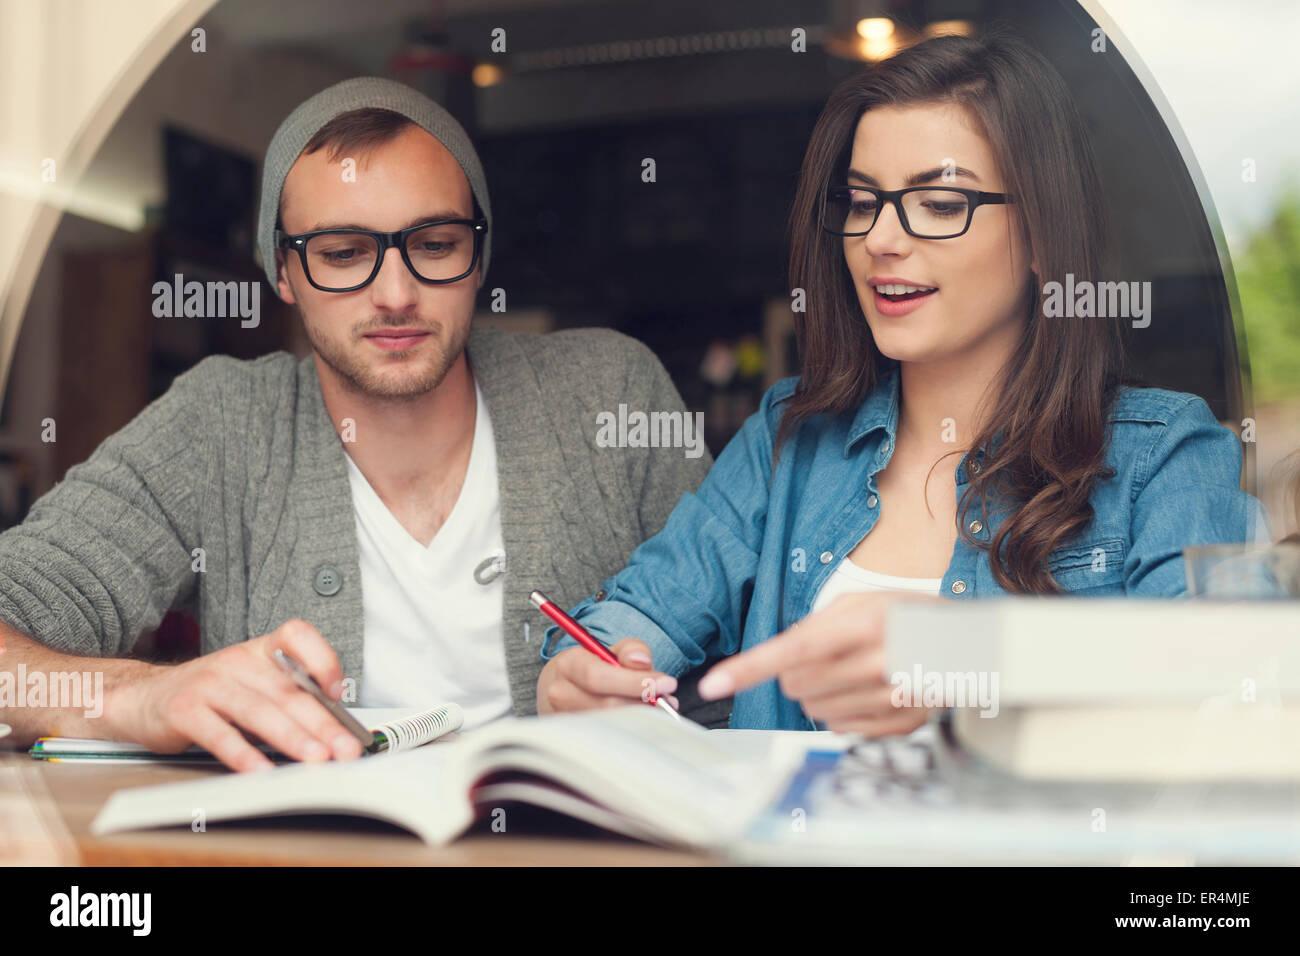 Hipster pareja joven estudian juntos en el café. Cracovia, Polonia Foto de stock